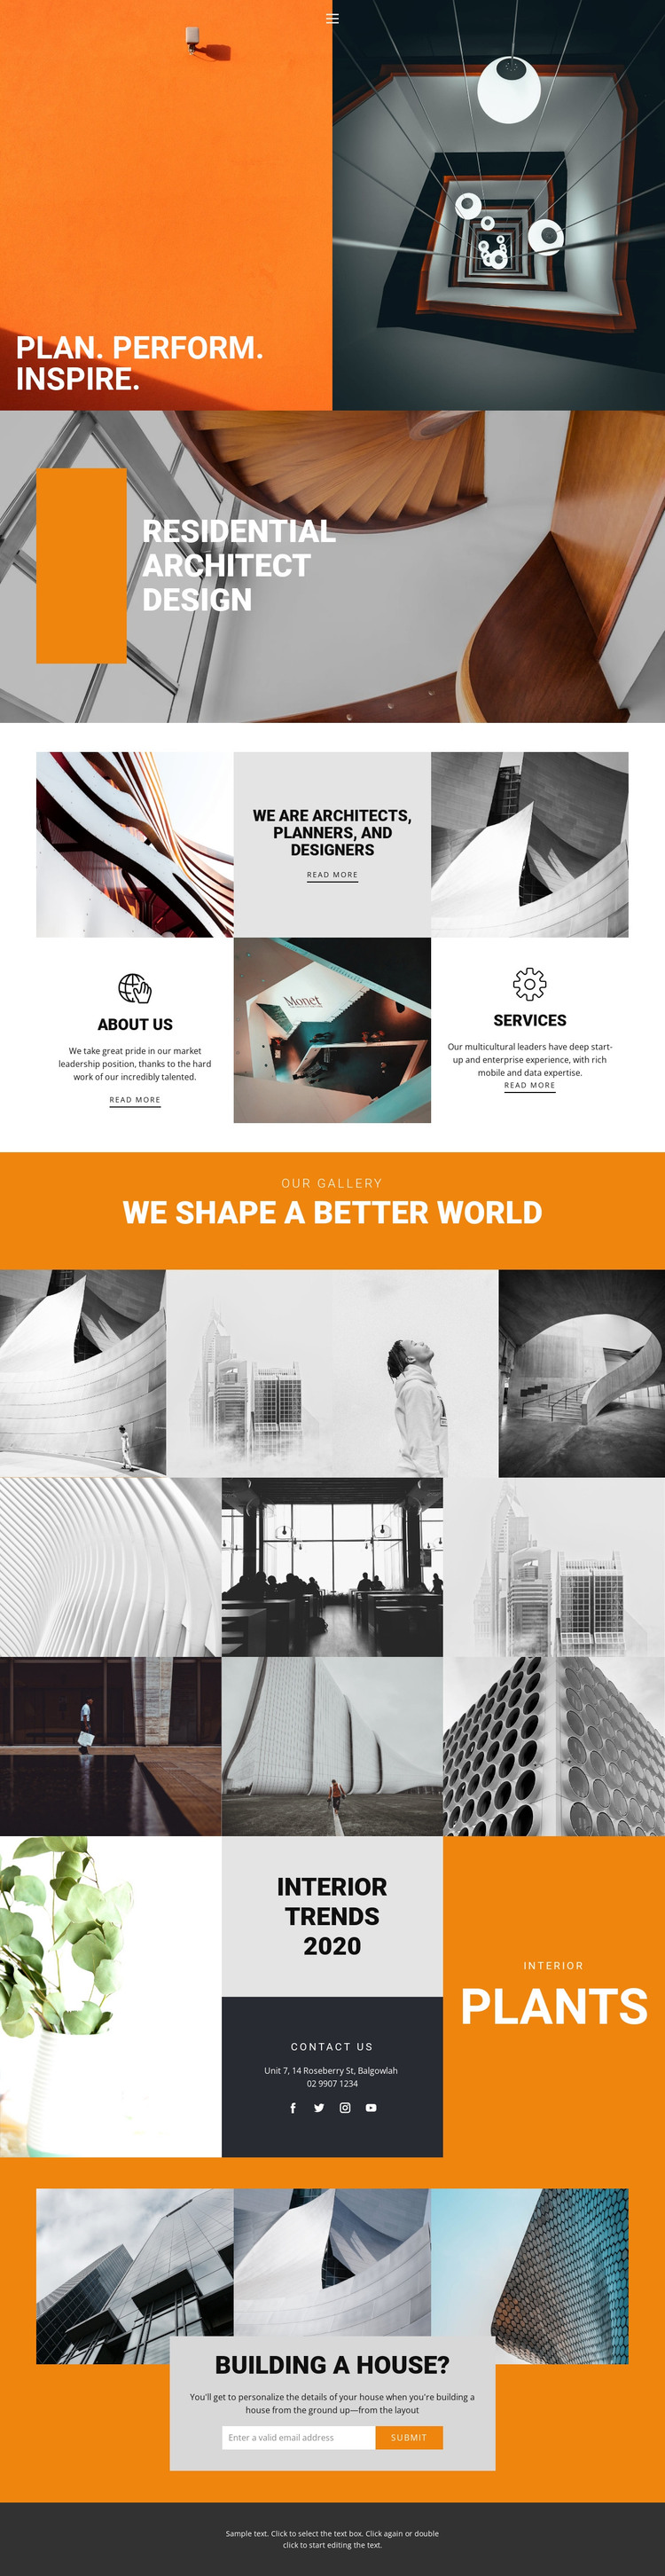 Inspiring ways of architecture WordPress Theme